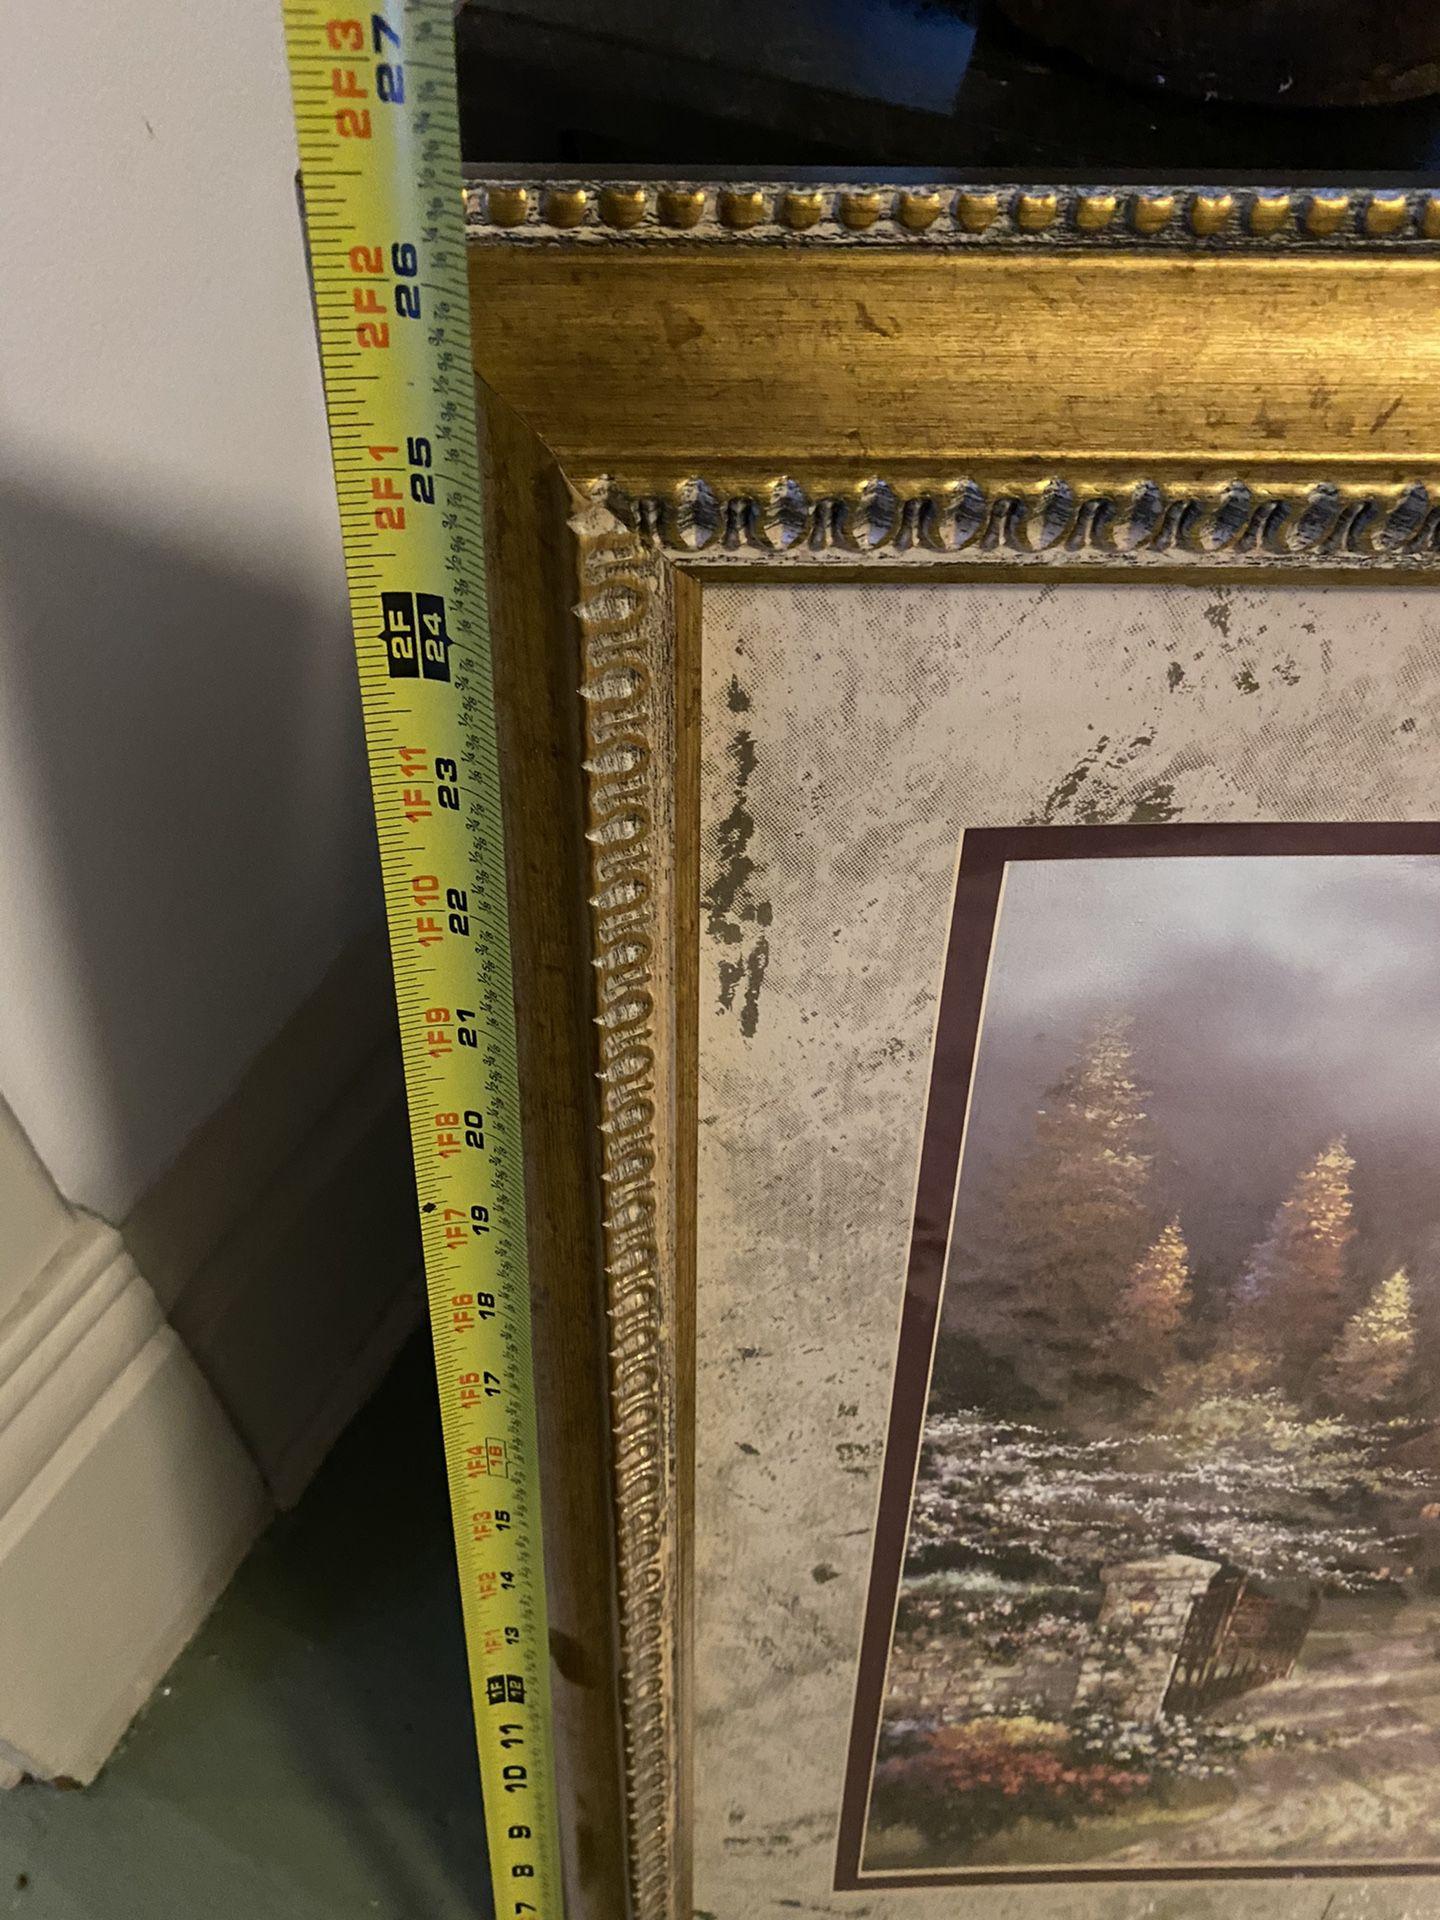 Painting / Artist / Art / Drawing / Photograph / Canvas / Artwork / Gold frame